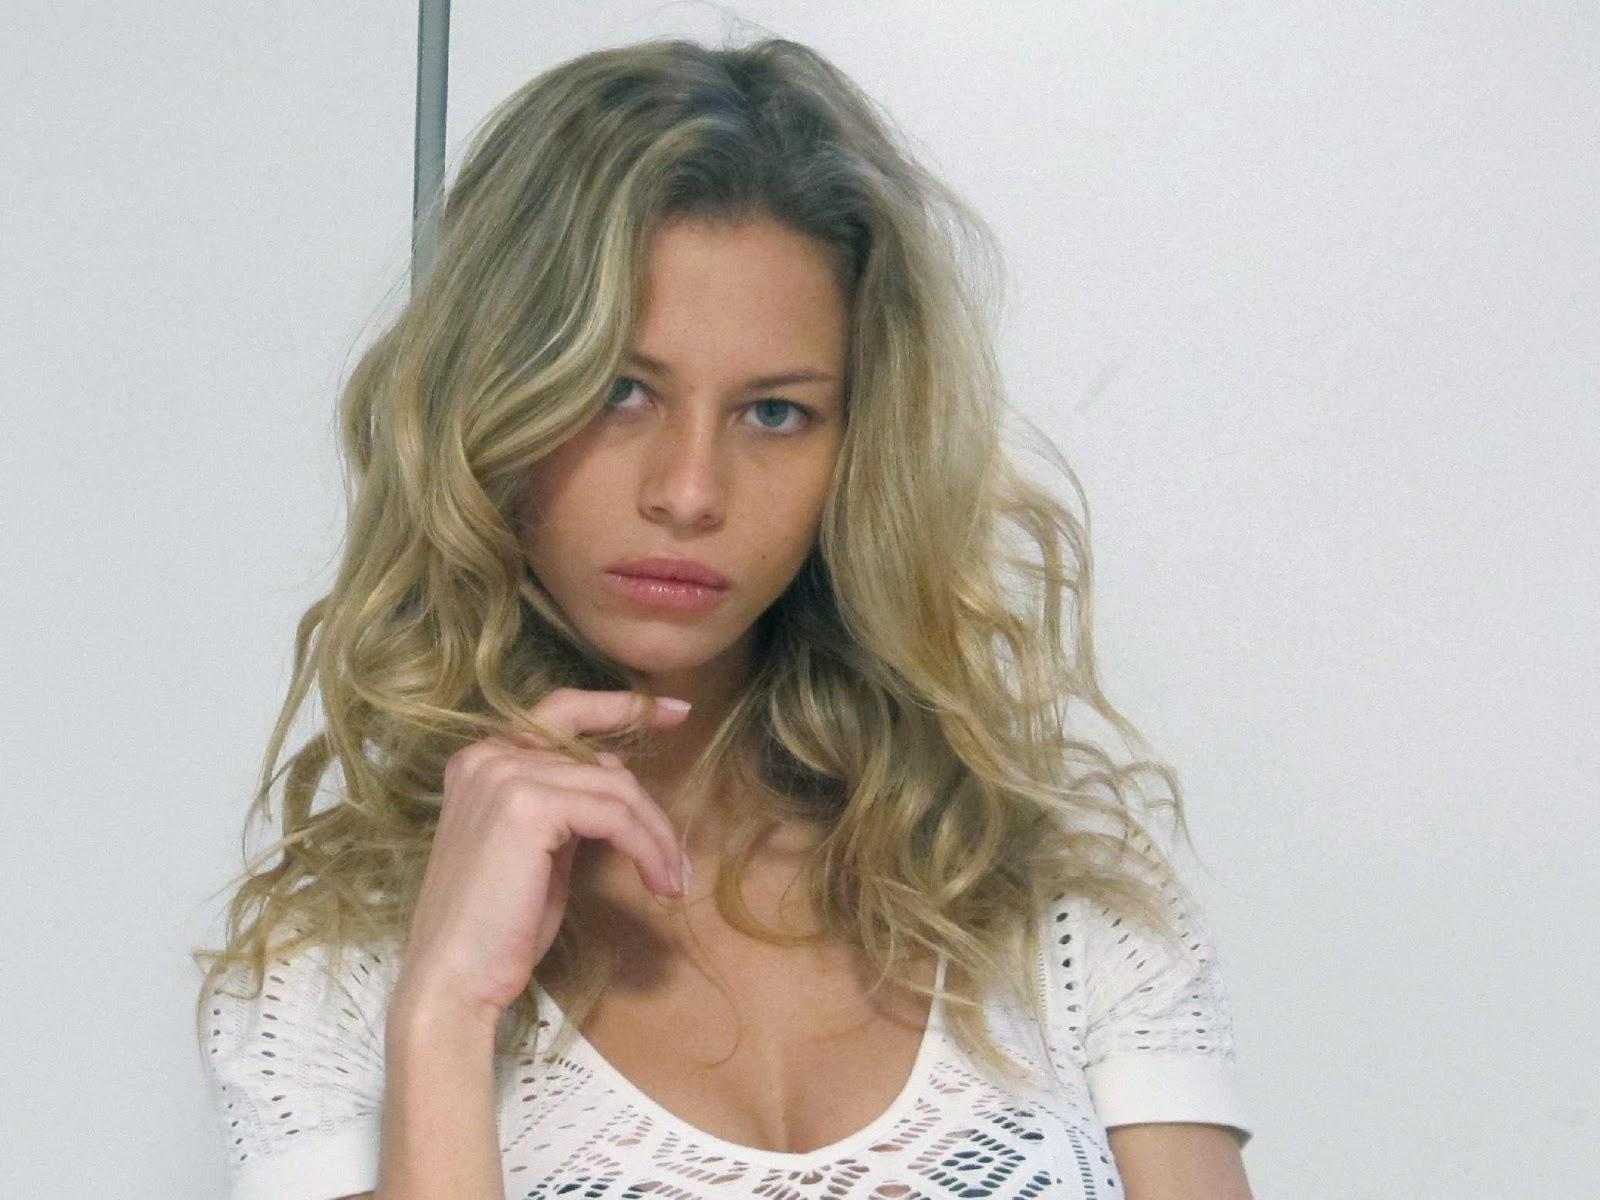 Janaina Reis nude (34 fotos), pics Fappening, Snapchat, panties 2019